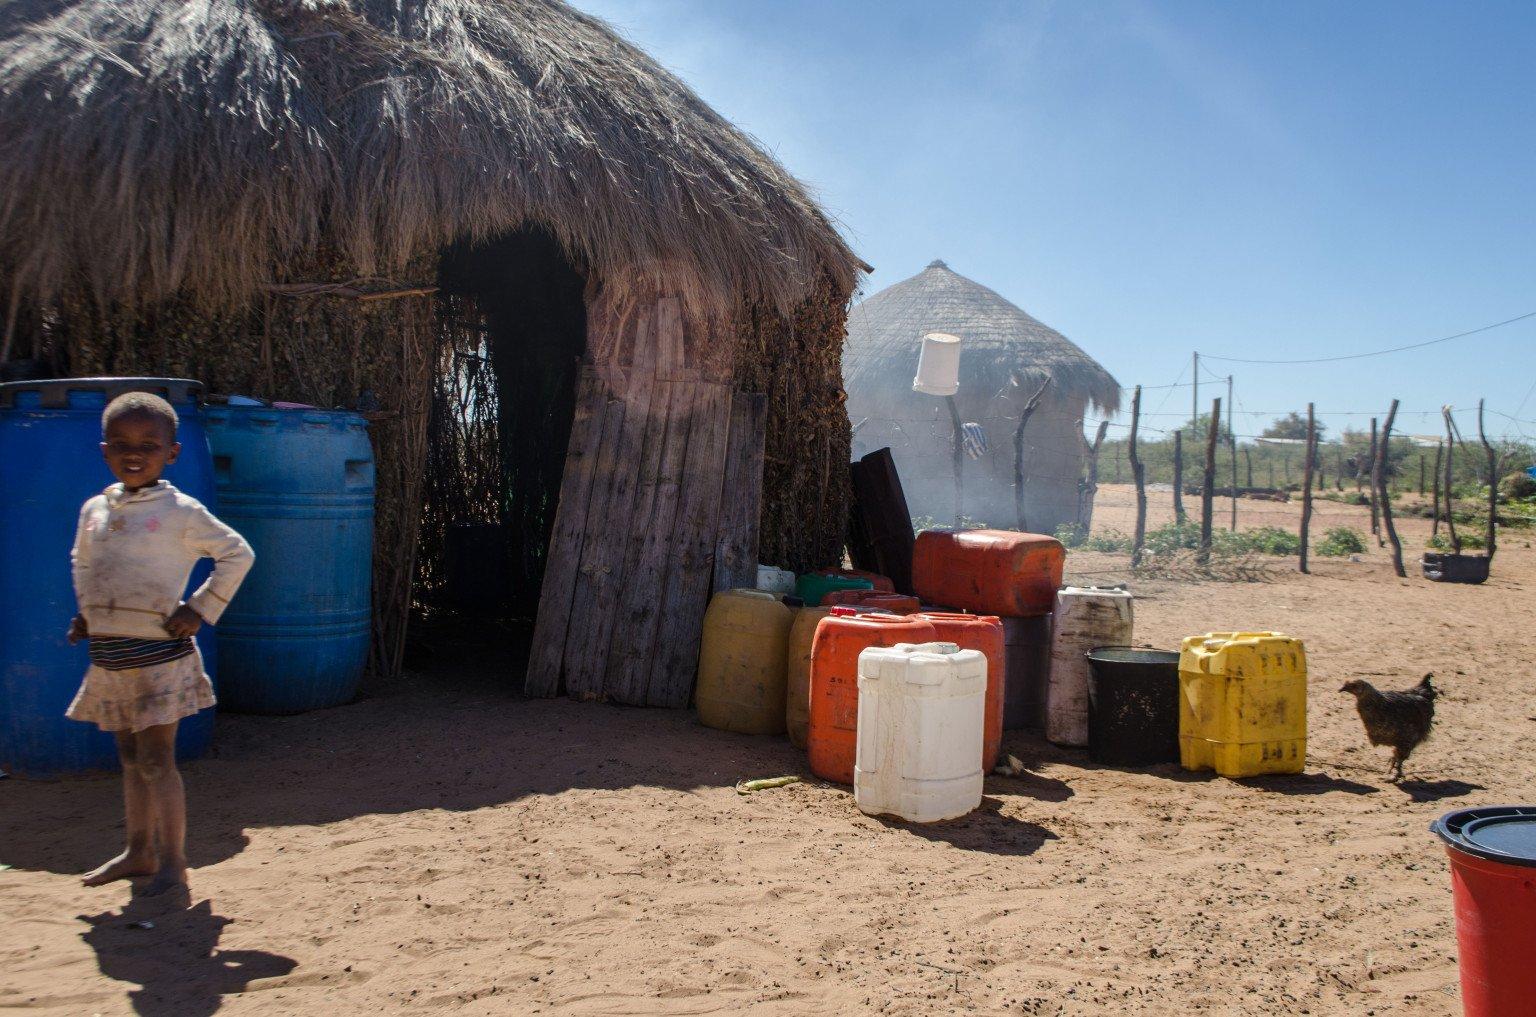 Diamantes y agua: la paradoja de Botsuana